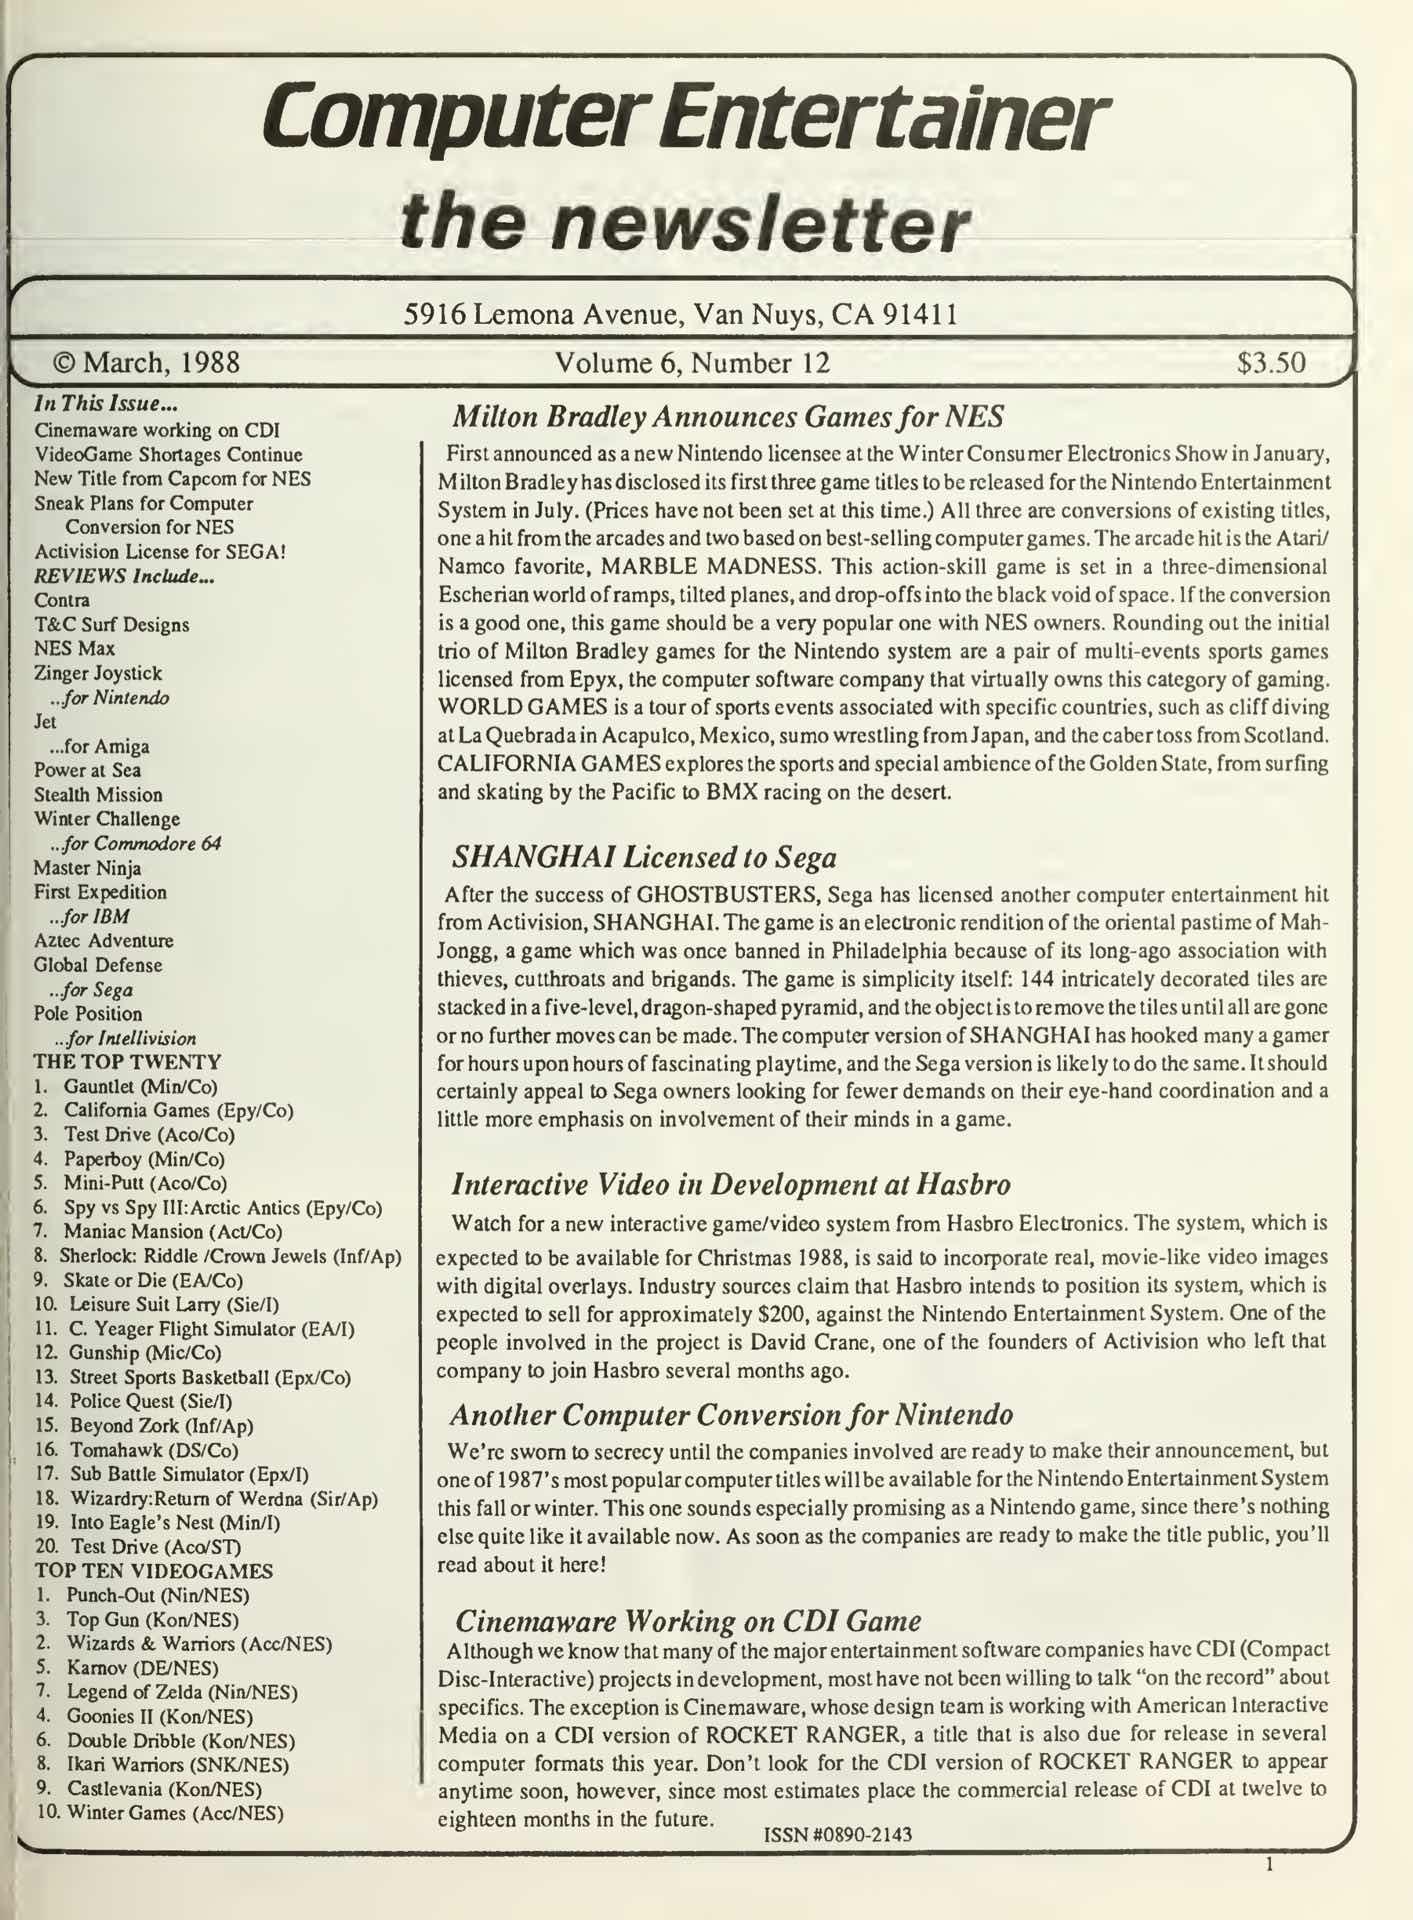 Computer Entertainer 1988 pg 1